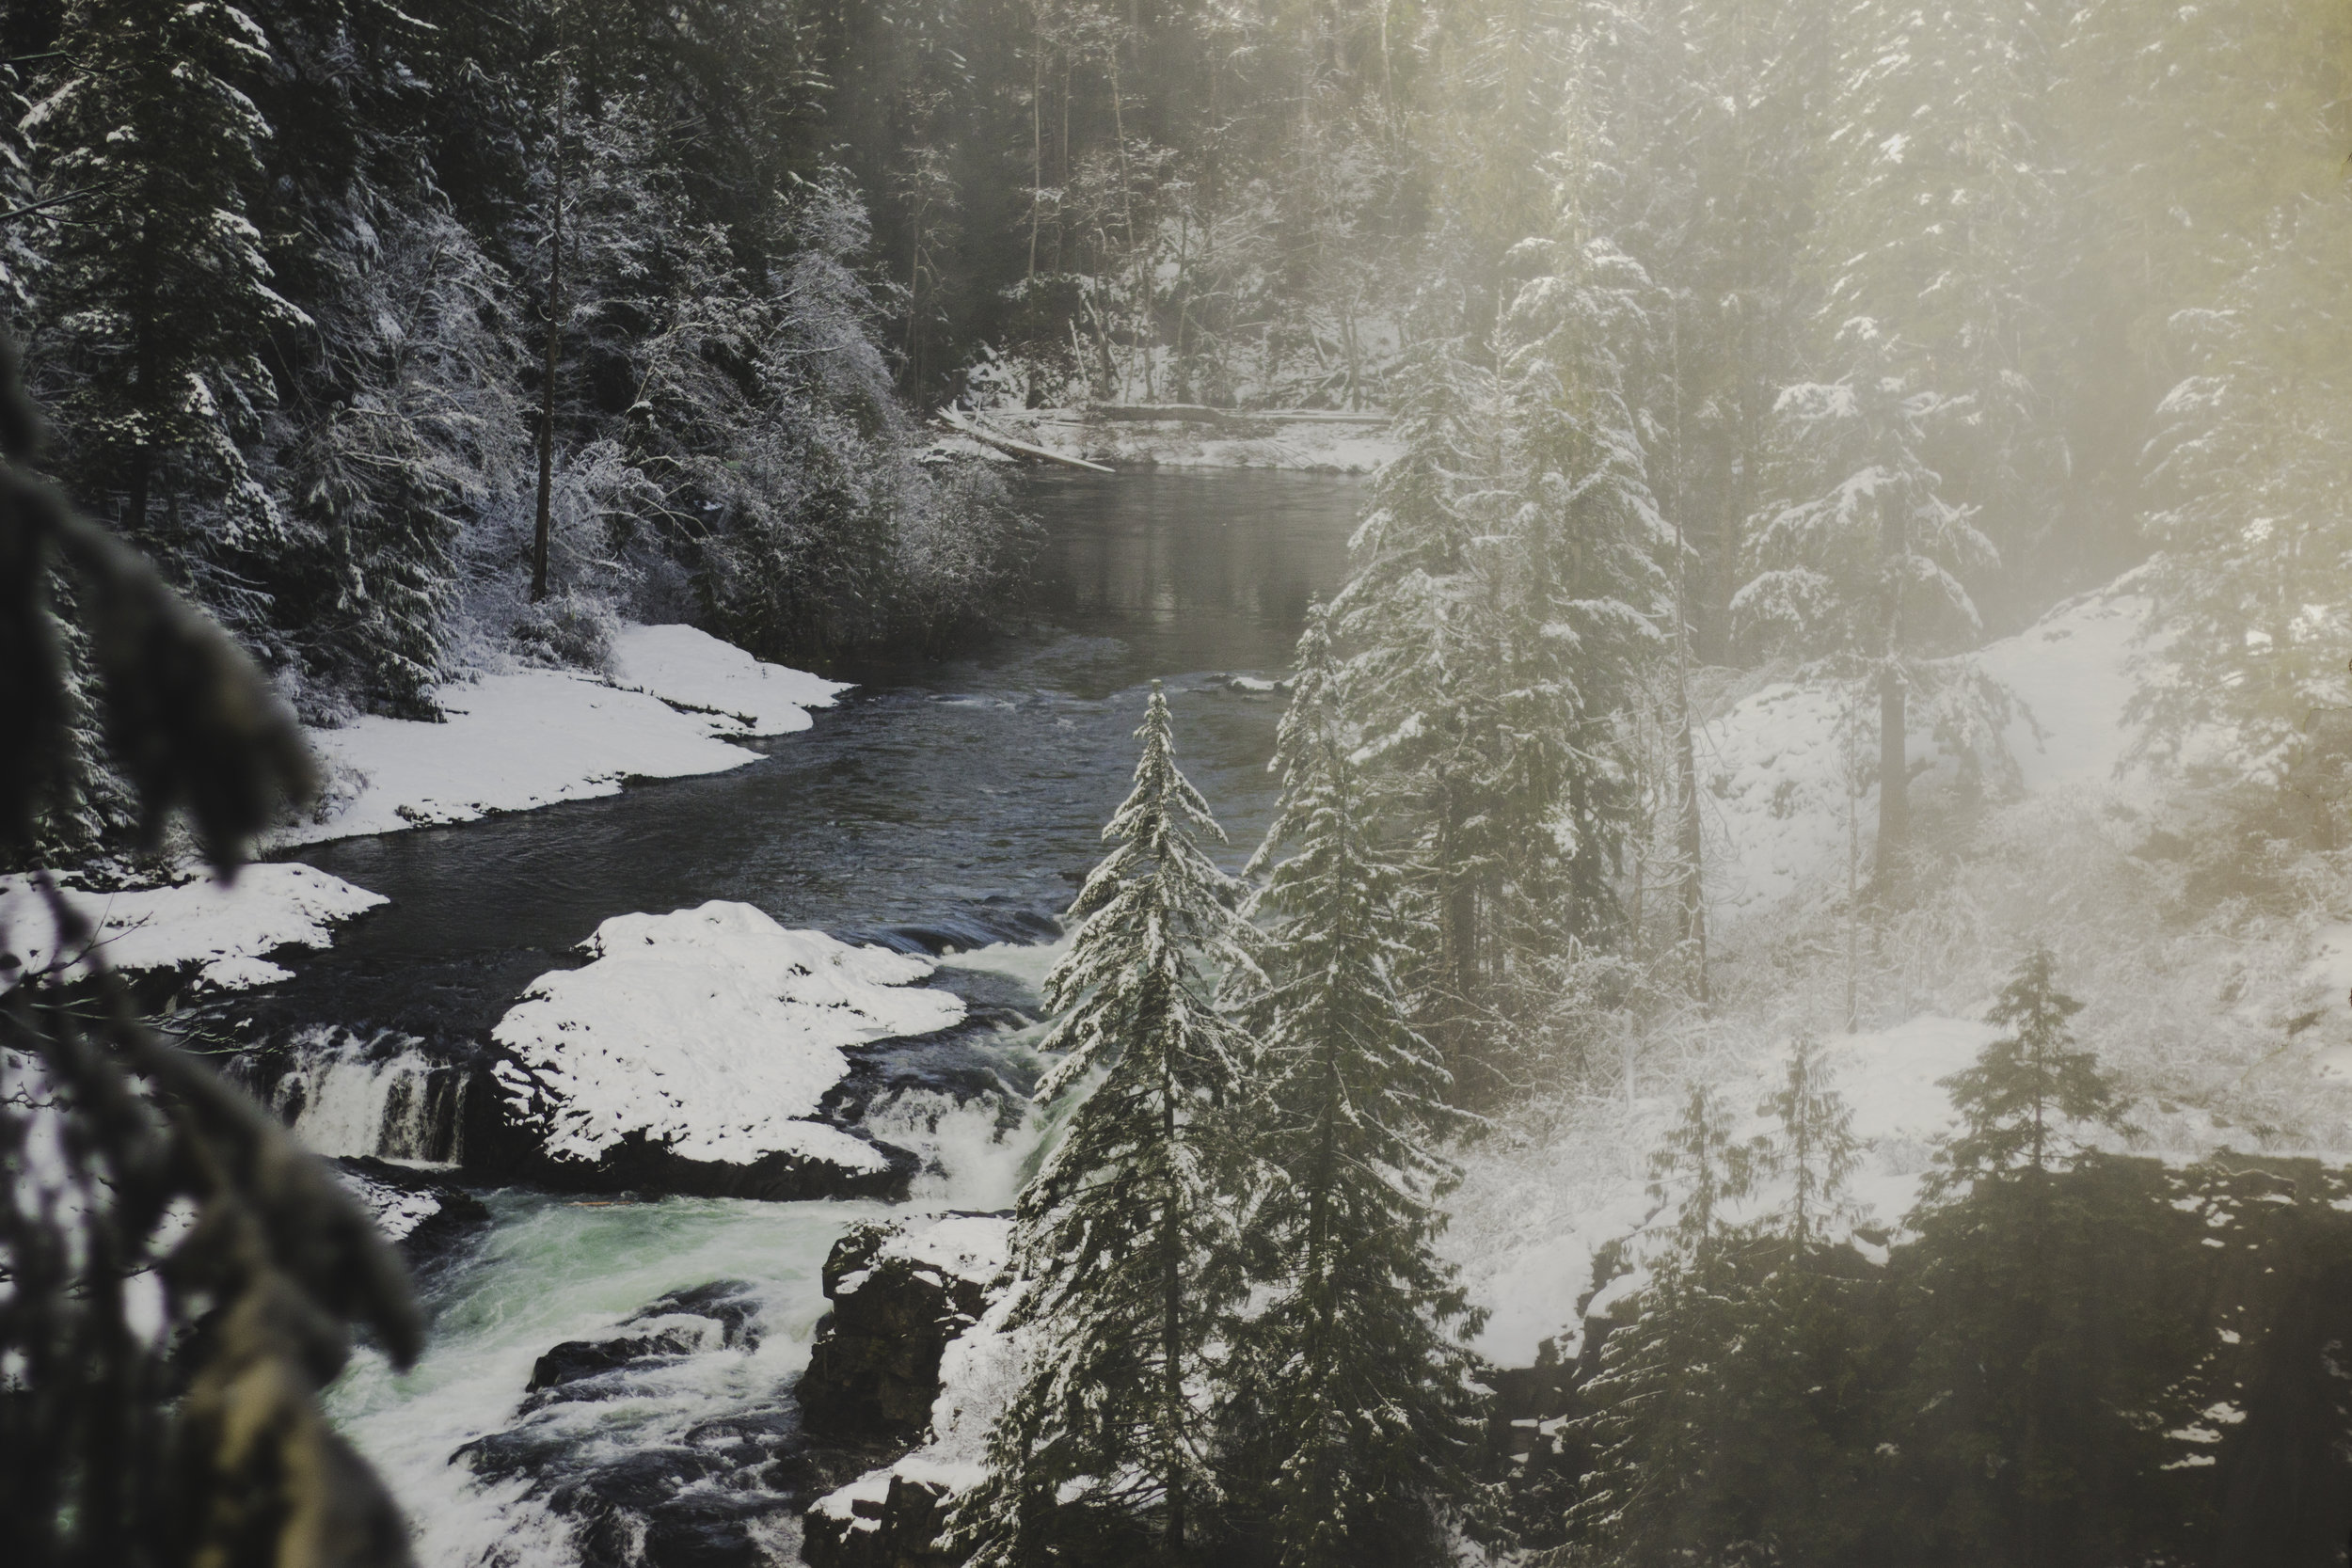 Campbell_River2.jpg